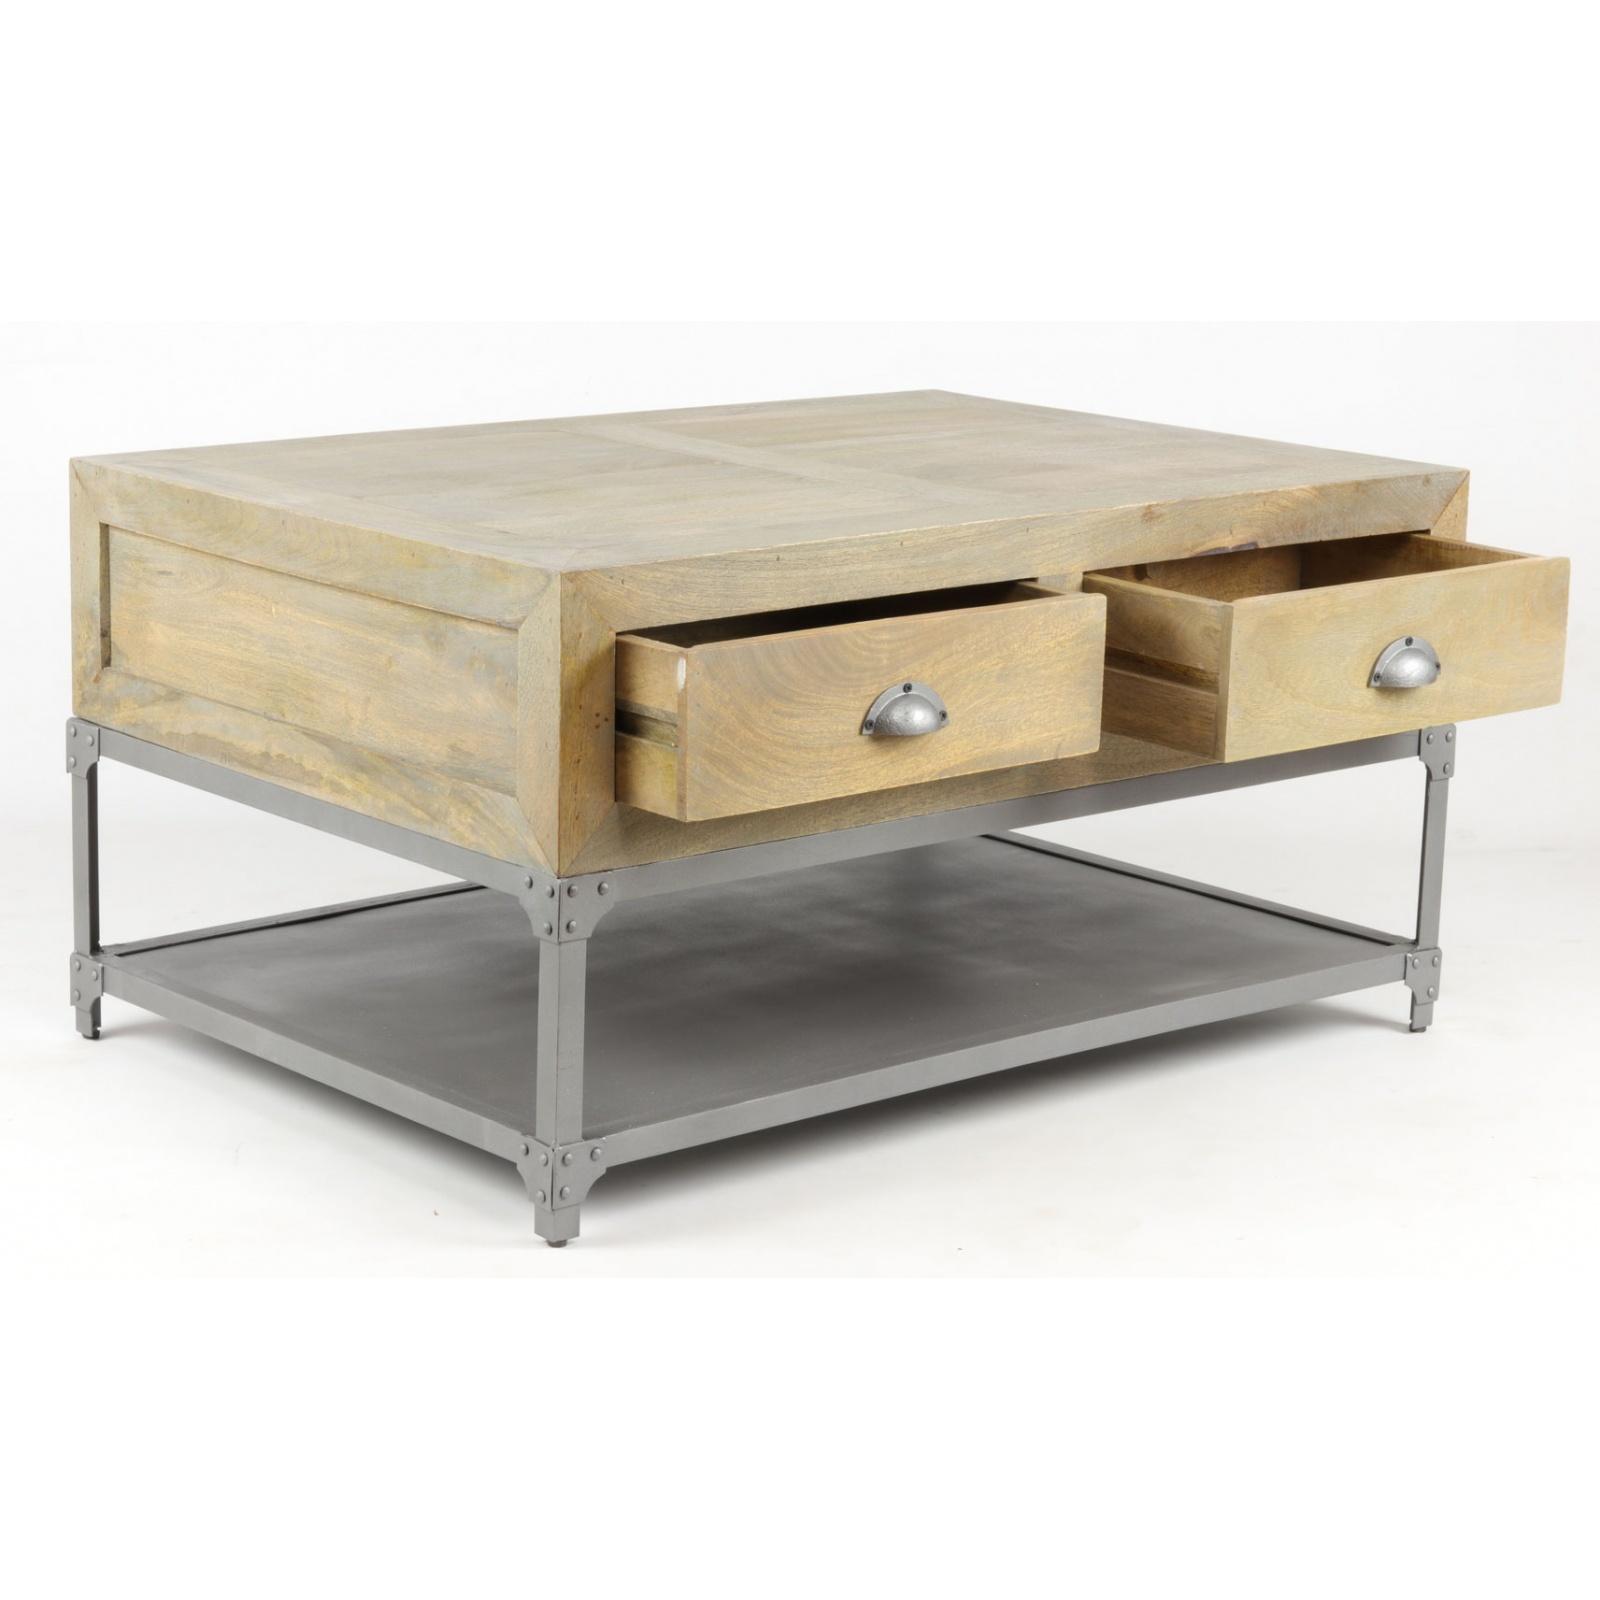 petite table basse industrielle jp2b d coration. Black Bedroom Furniture Sets. Home Design Ideas